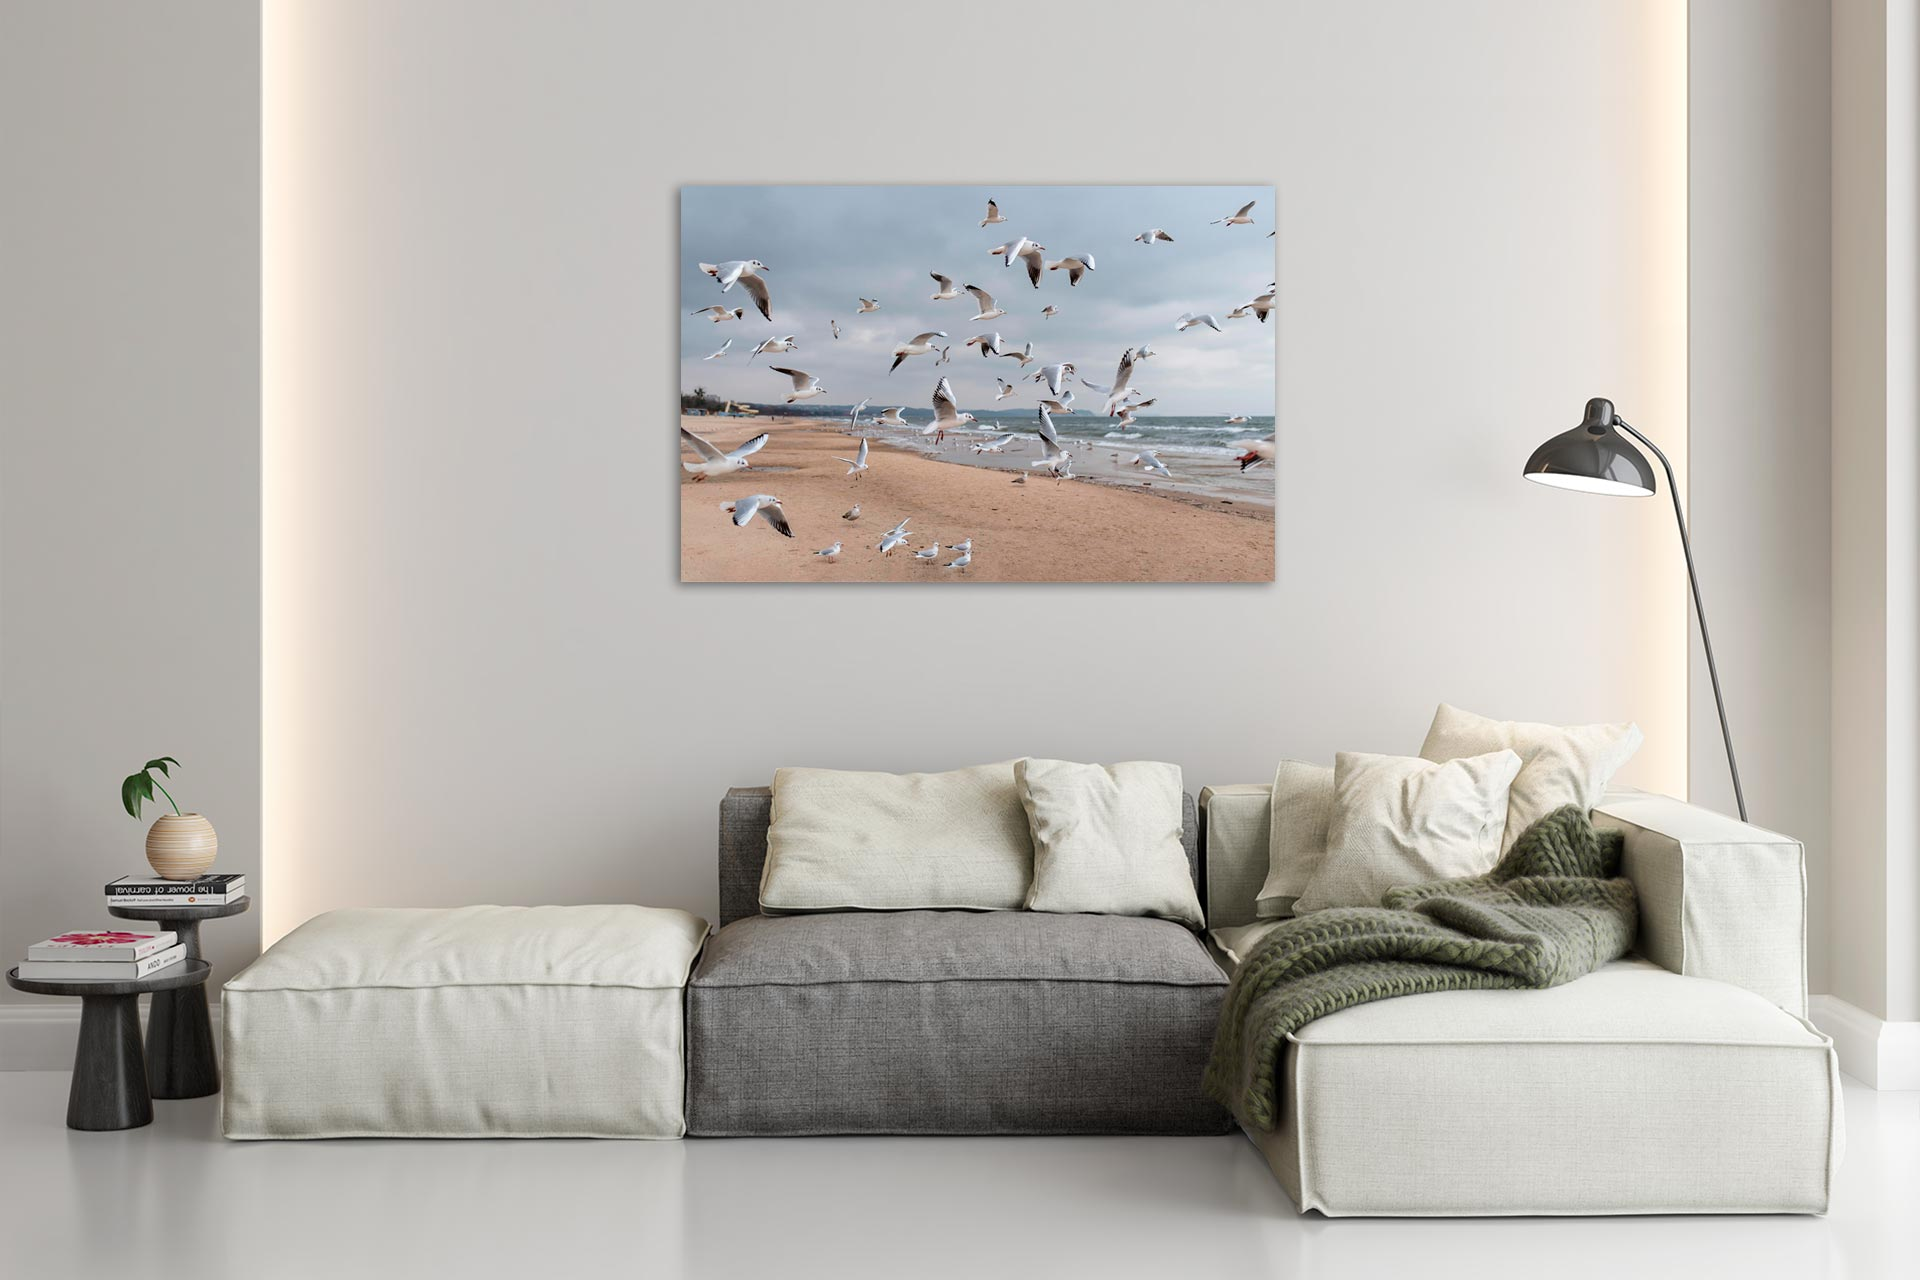 LCW490-mewa-moewe-ostsee-wandbild-leinwand-acrylglas-aludibond-wohnzimmer